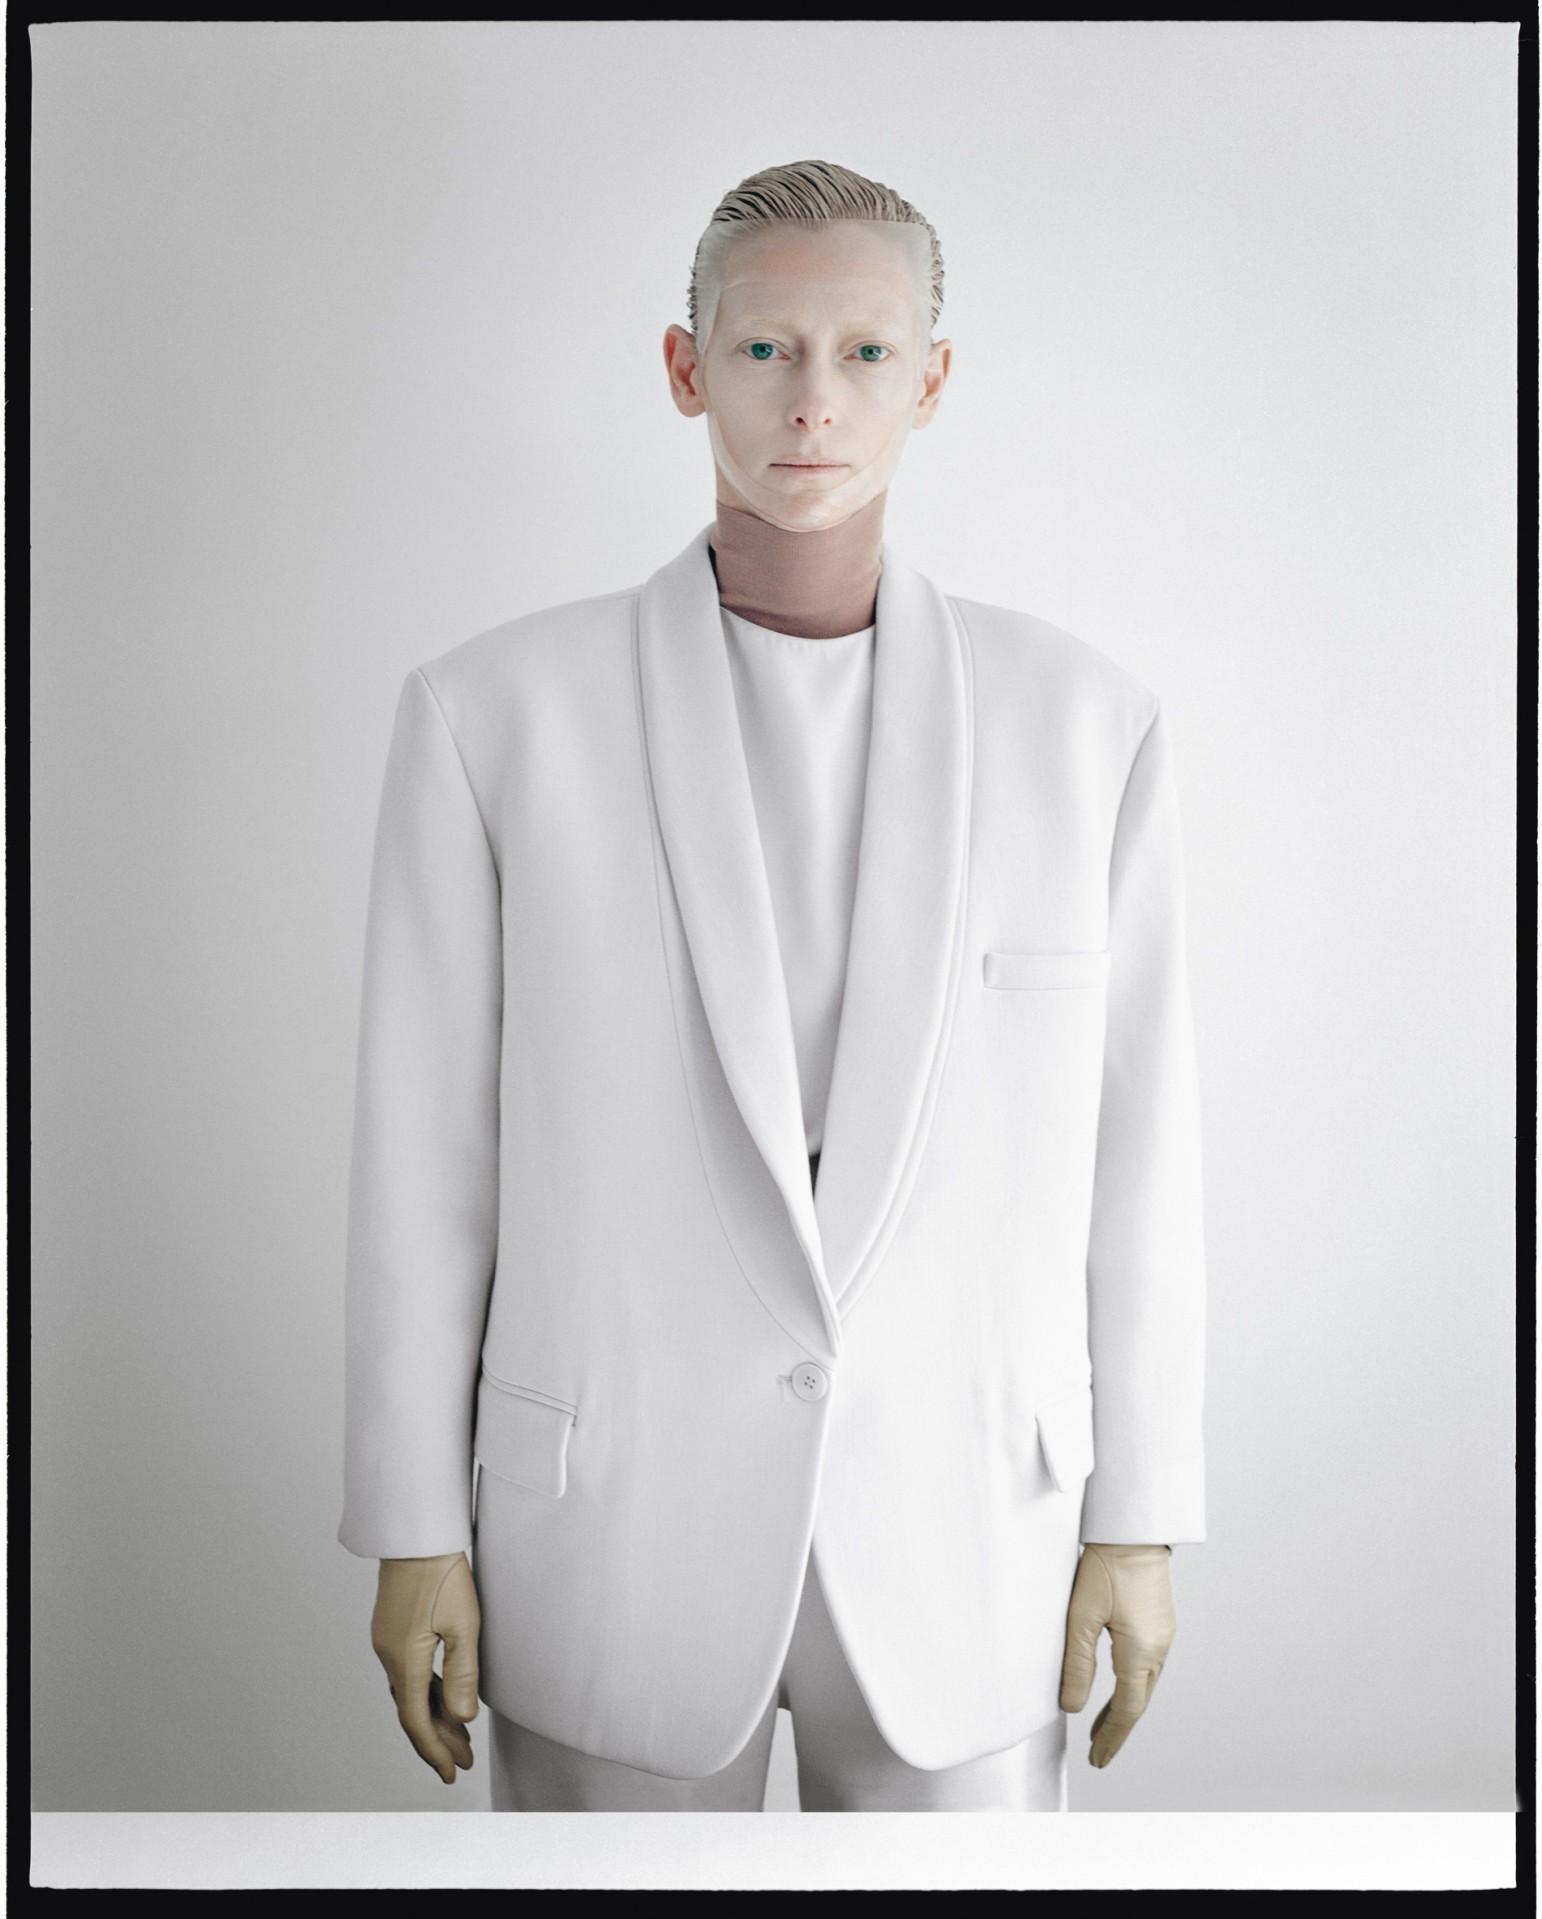 David Bowie's Visual Legacy